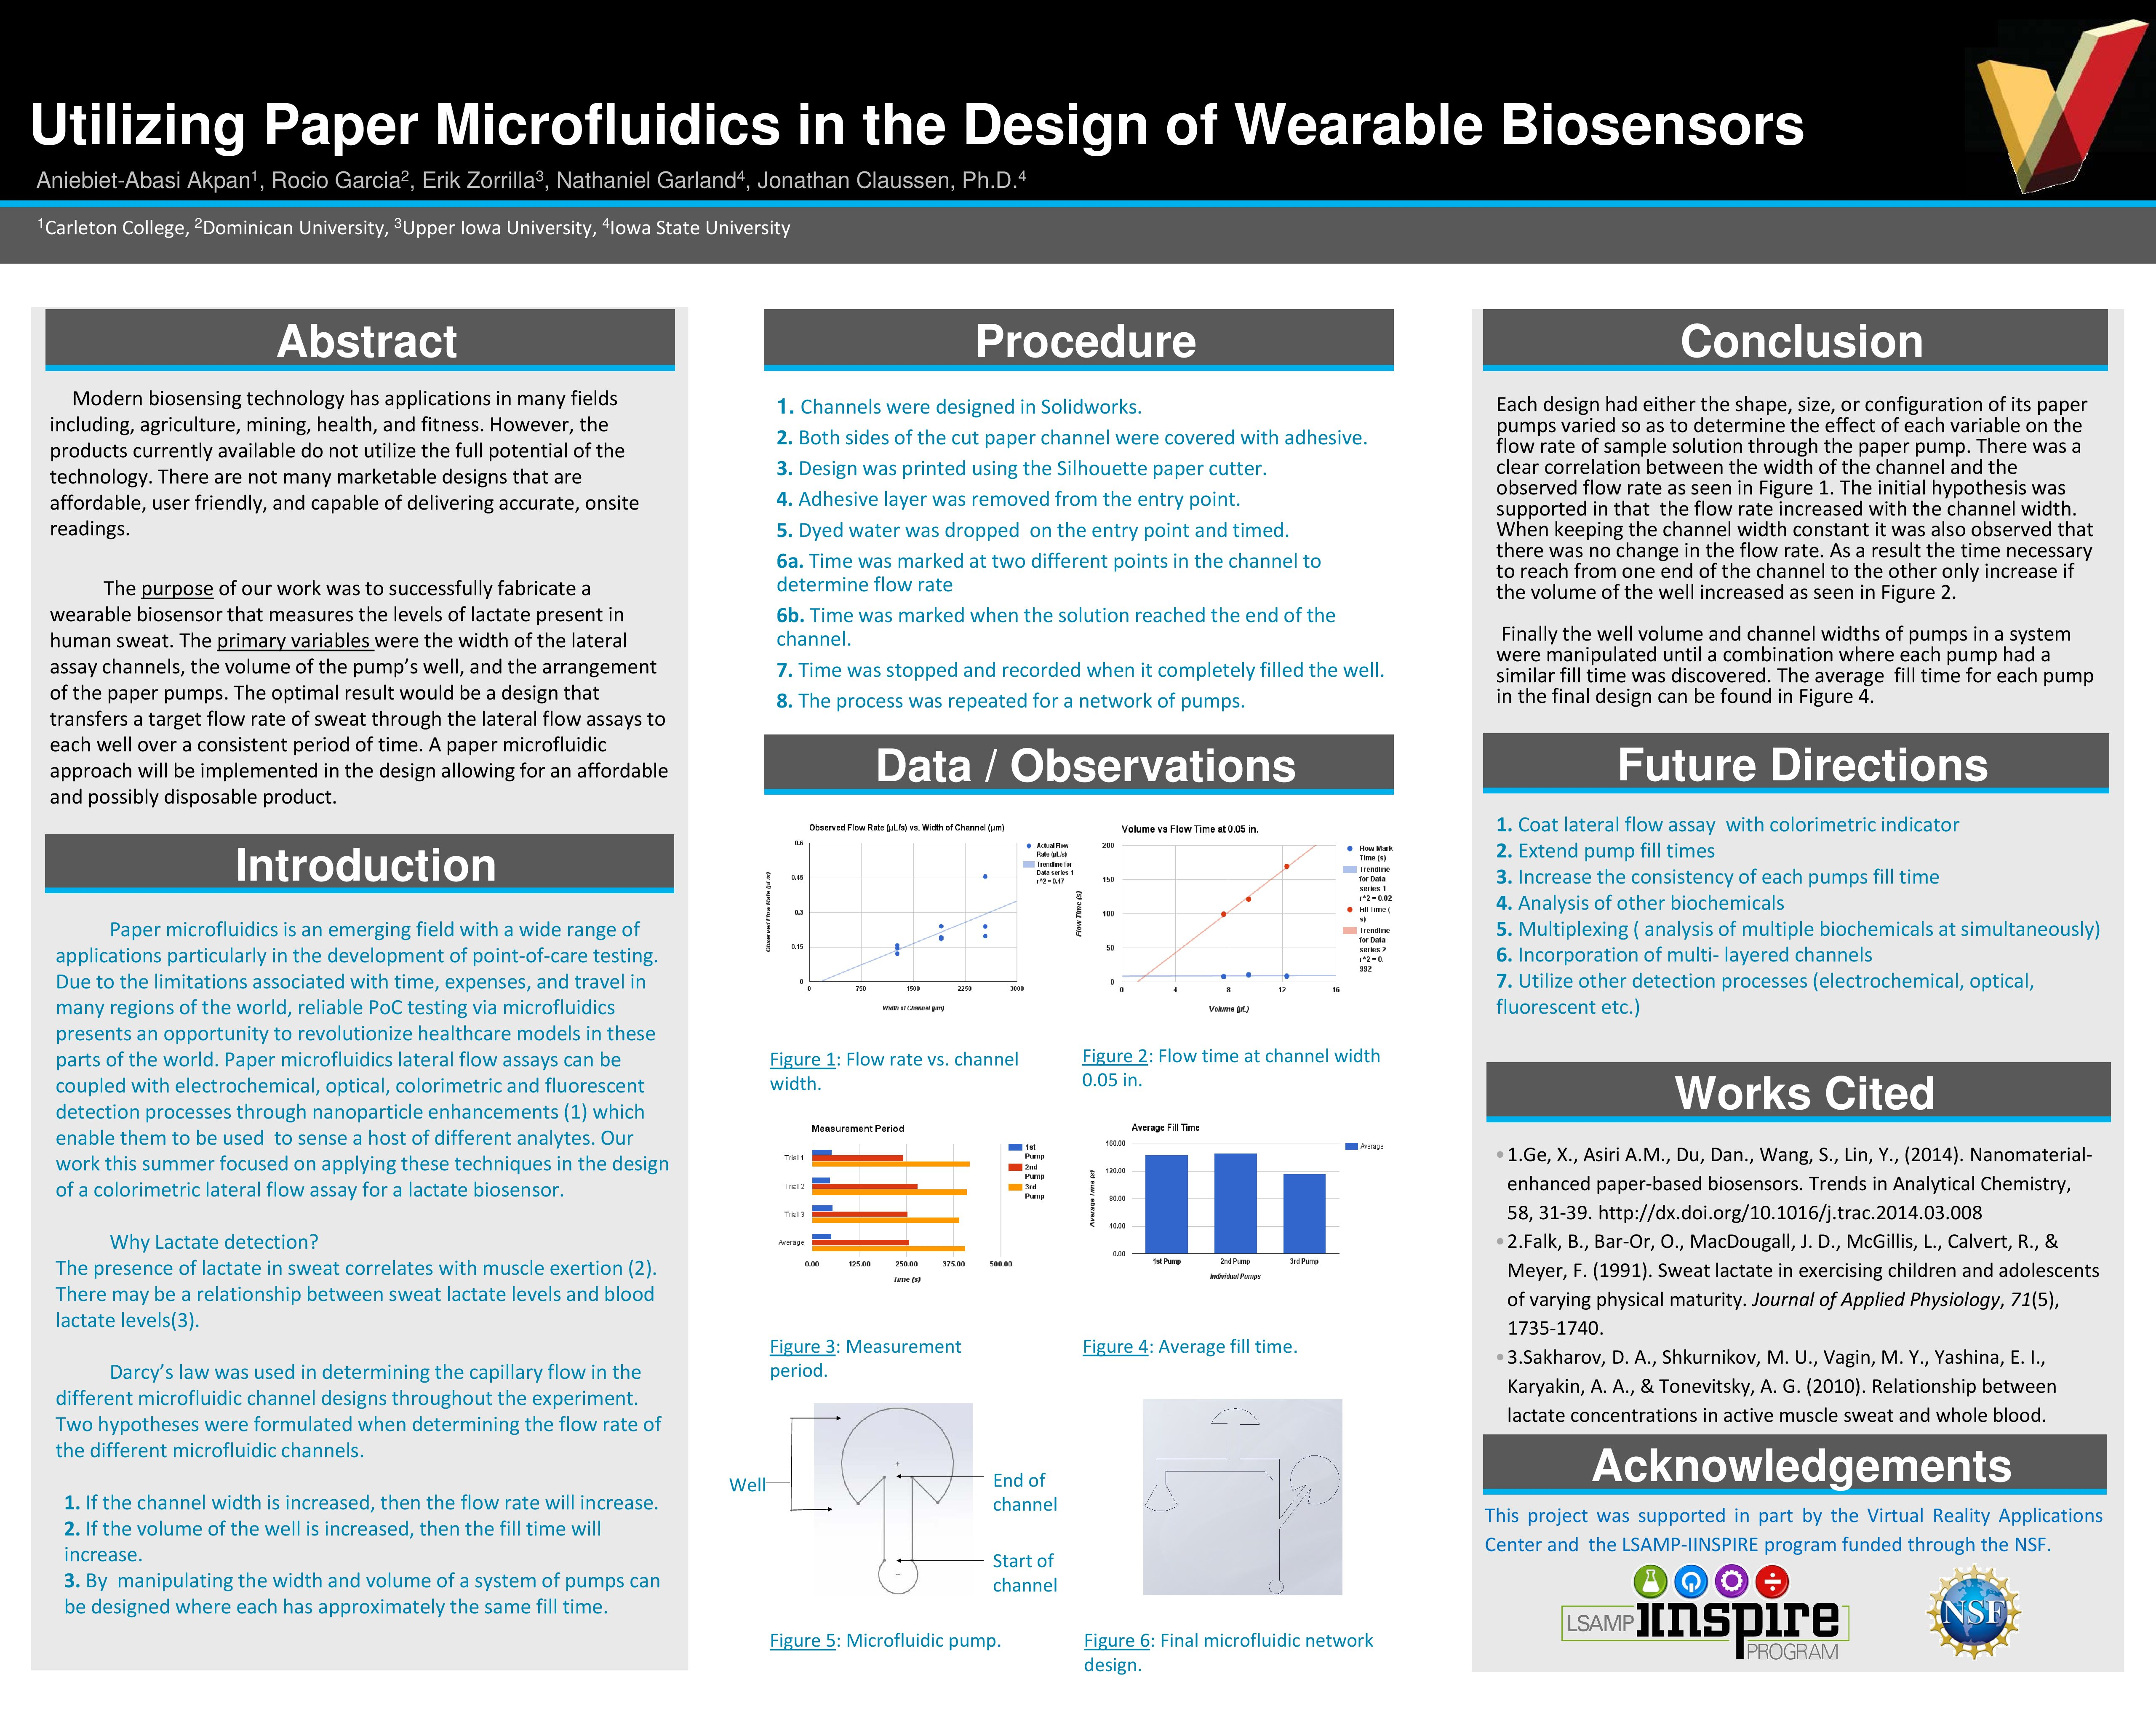 Wearable Biosensors poster